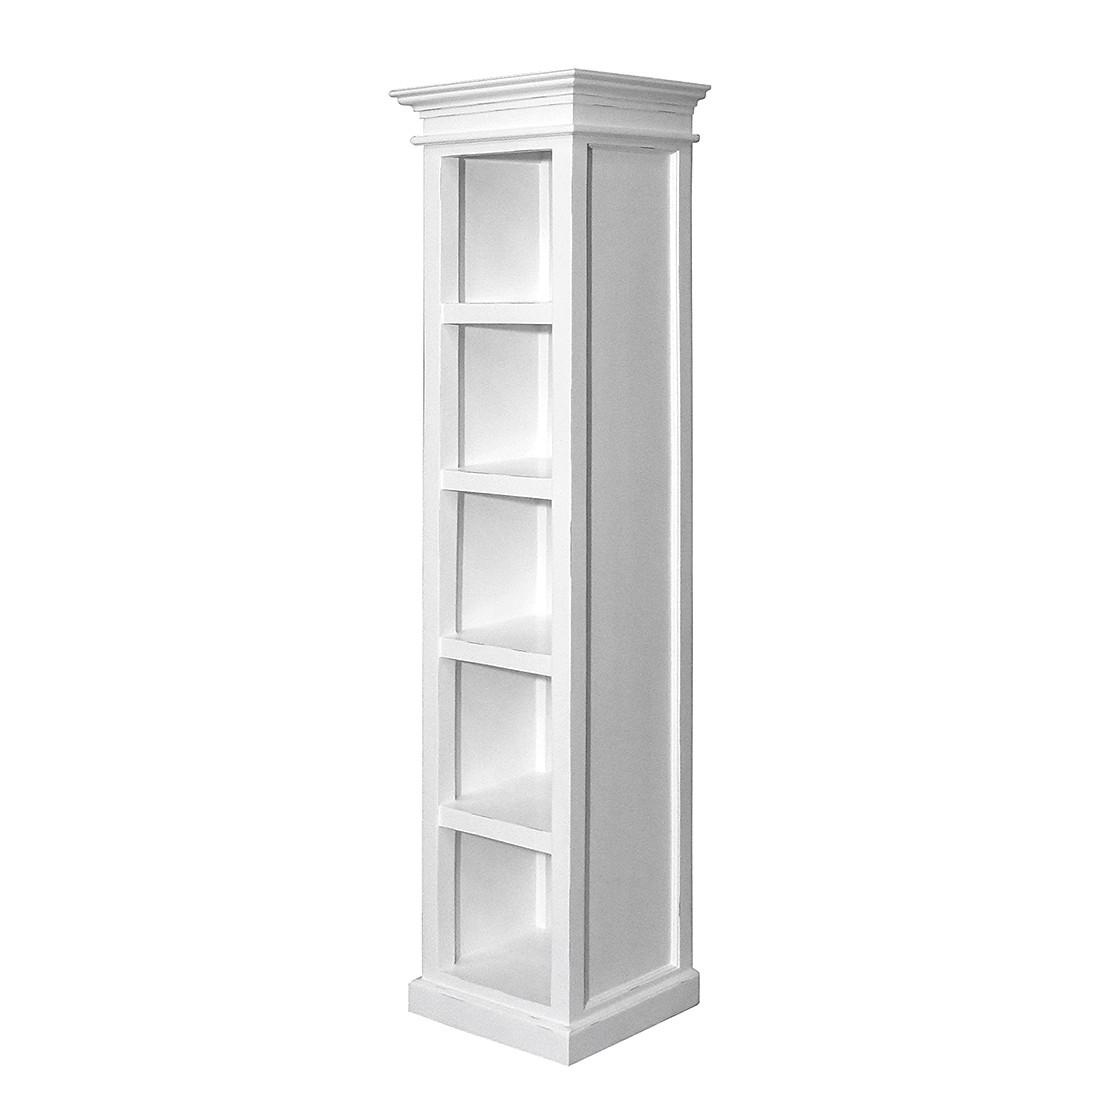 Bücherregal Halifax I – Mahagonie massiv, Nova Solo günstig bestellen